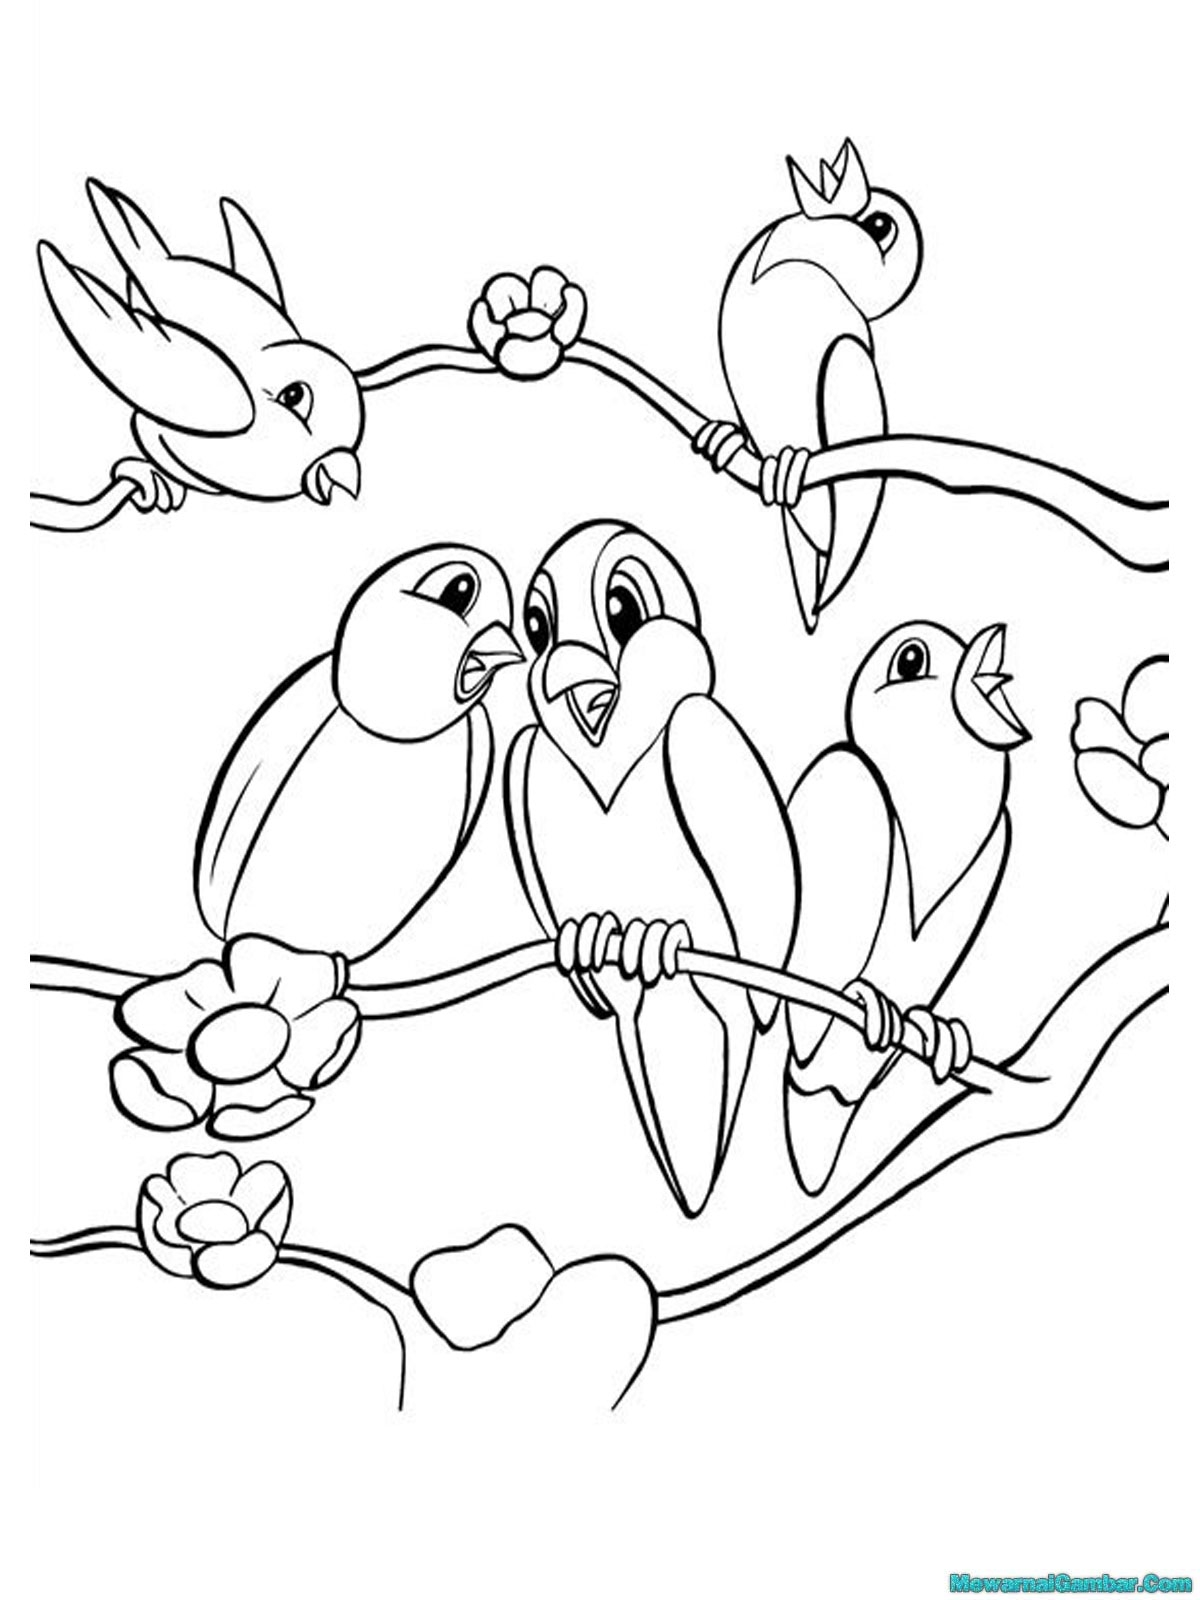 Mewarnai Gambar Quot Burung Hantu Quot Diatas Ranting Contoh